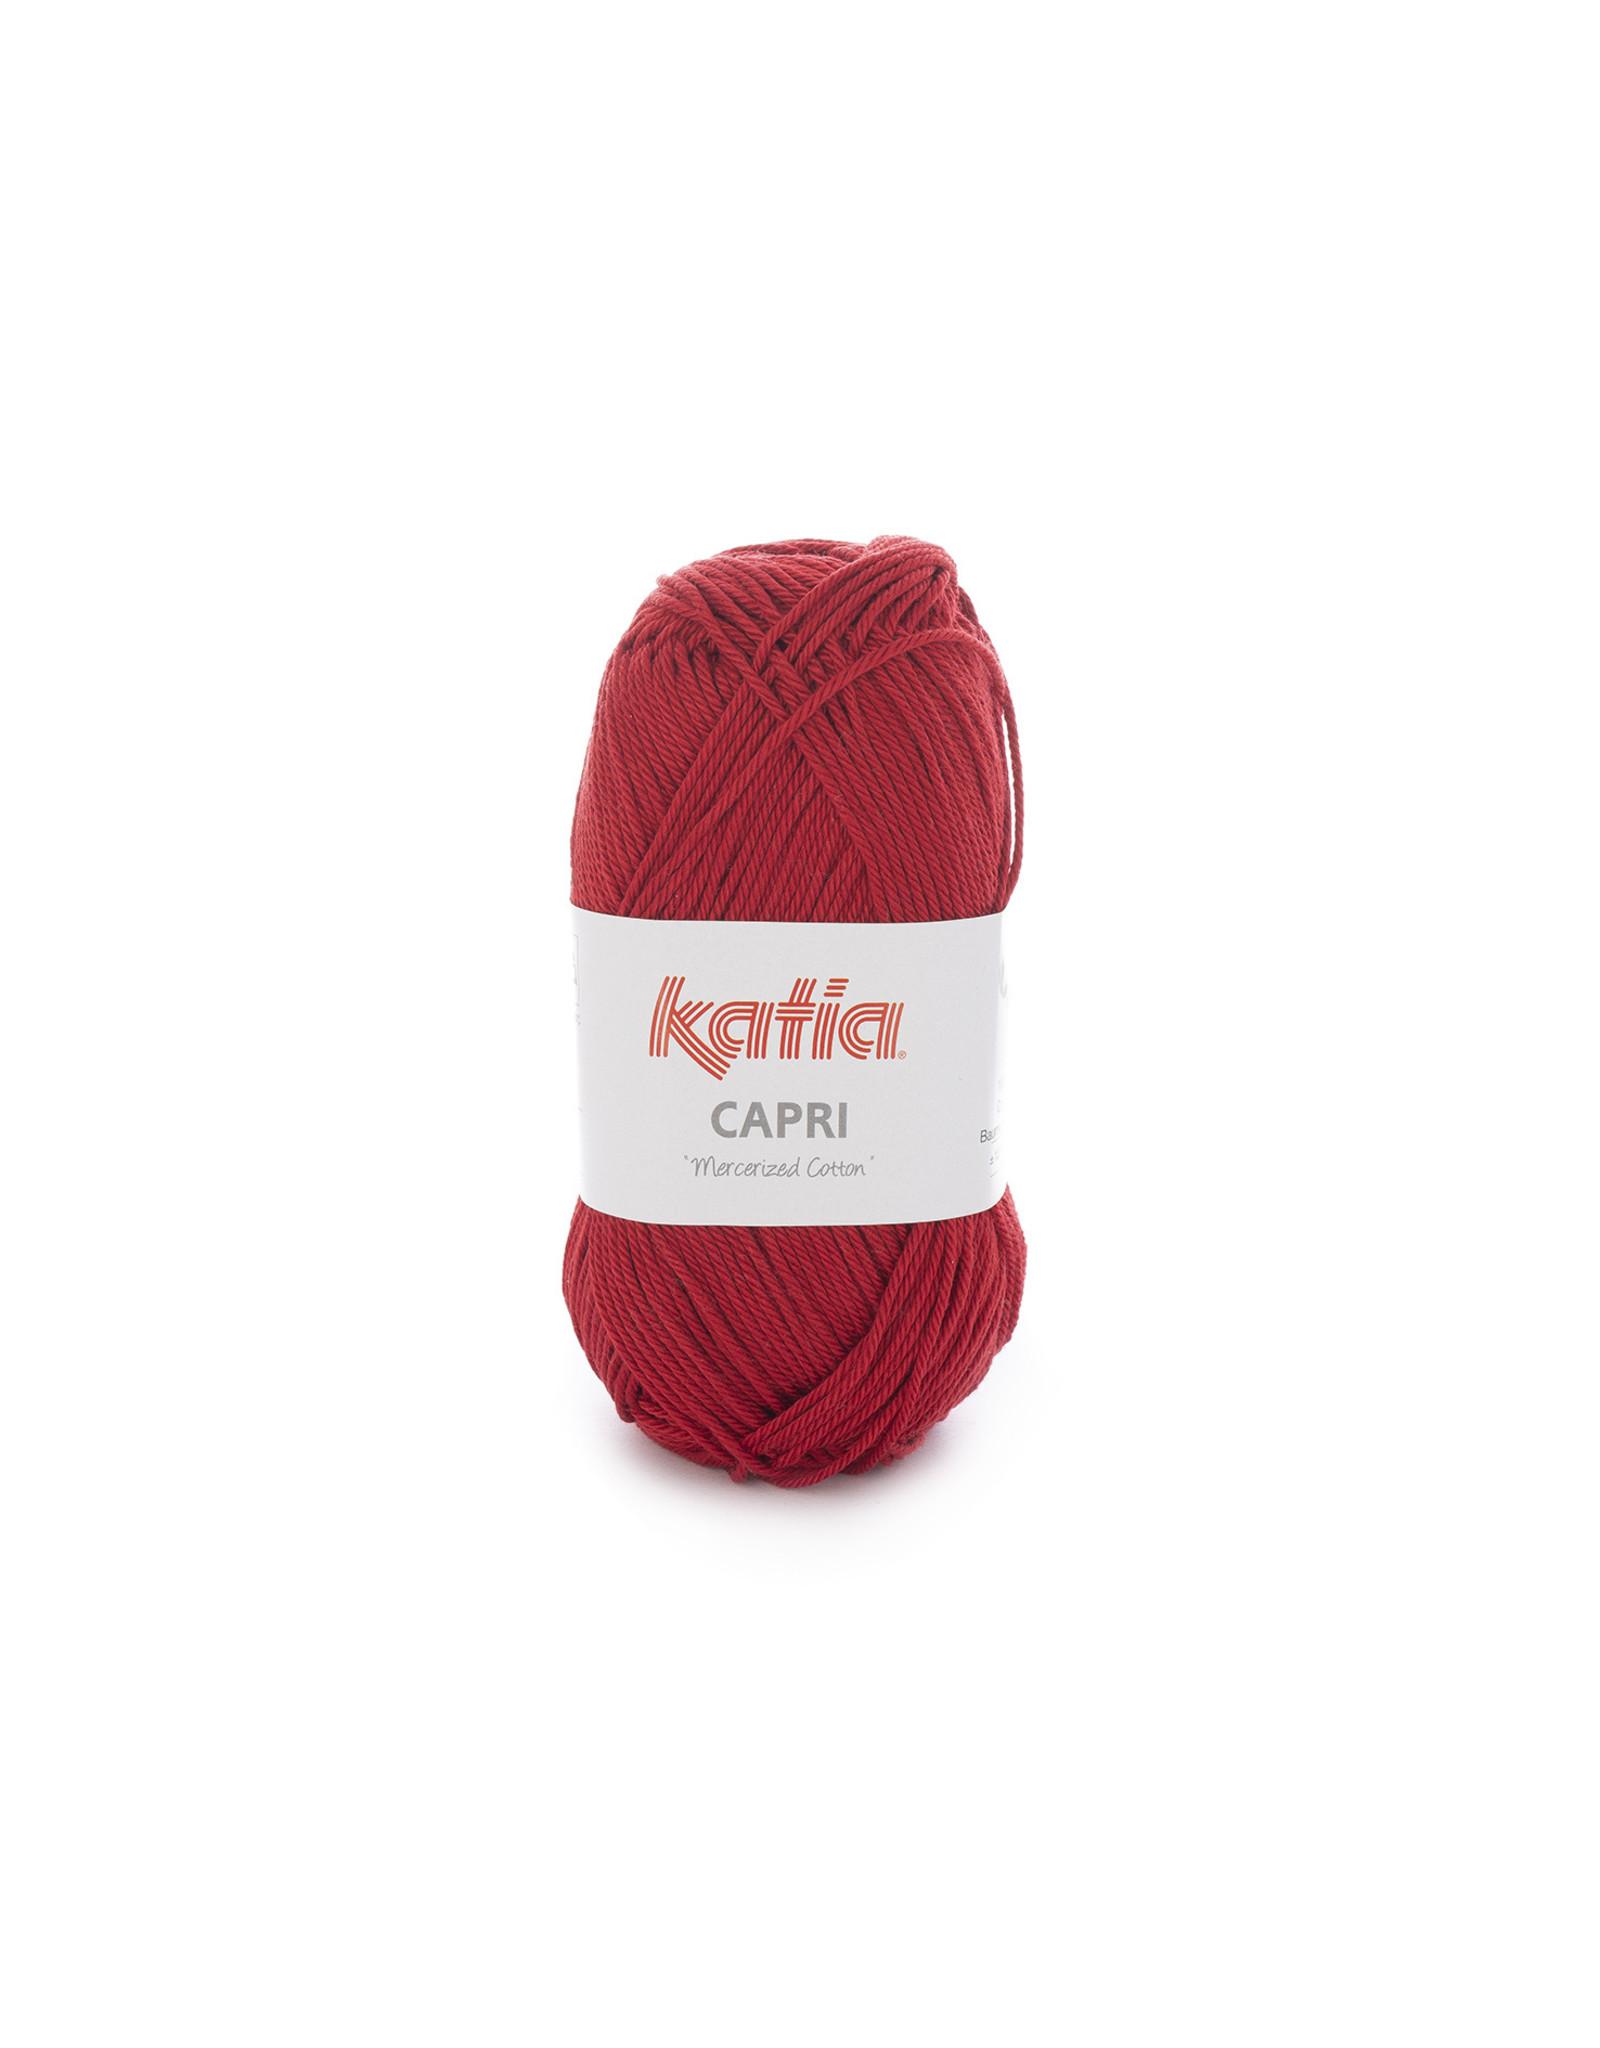 Katia Katia Capri - kleur 150 Wijnrood - bundel 5 x 50 gr. / 125 m. - 100% katoen